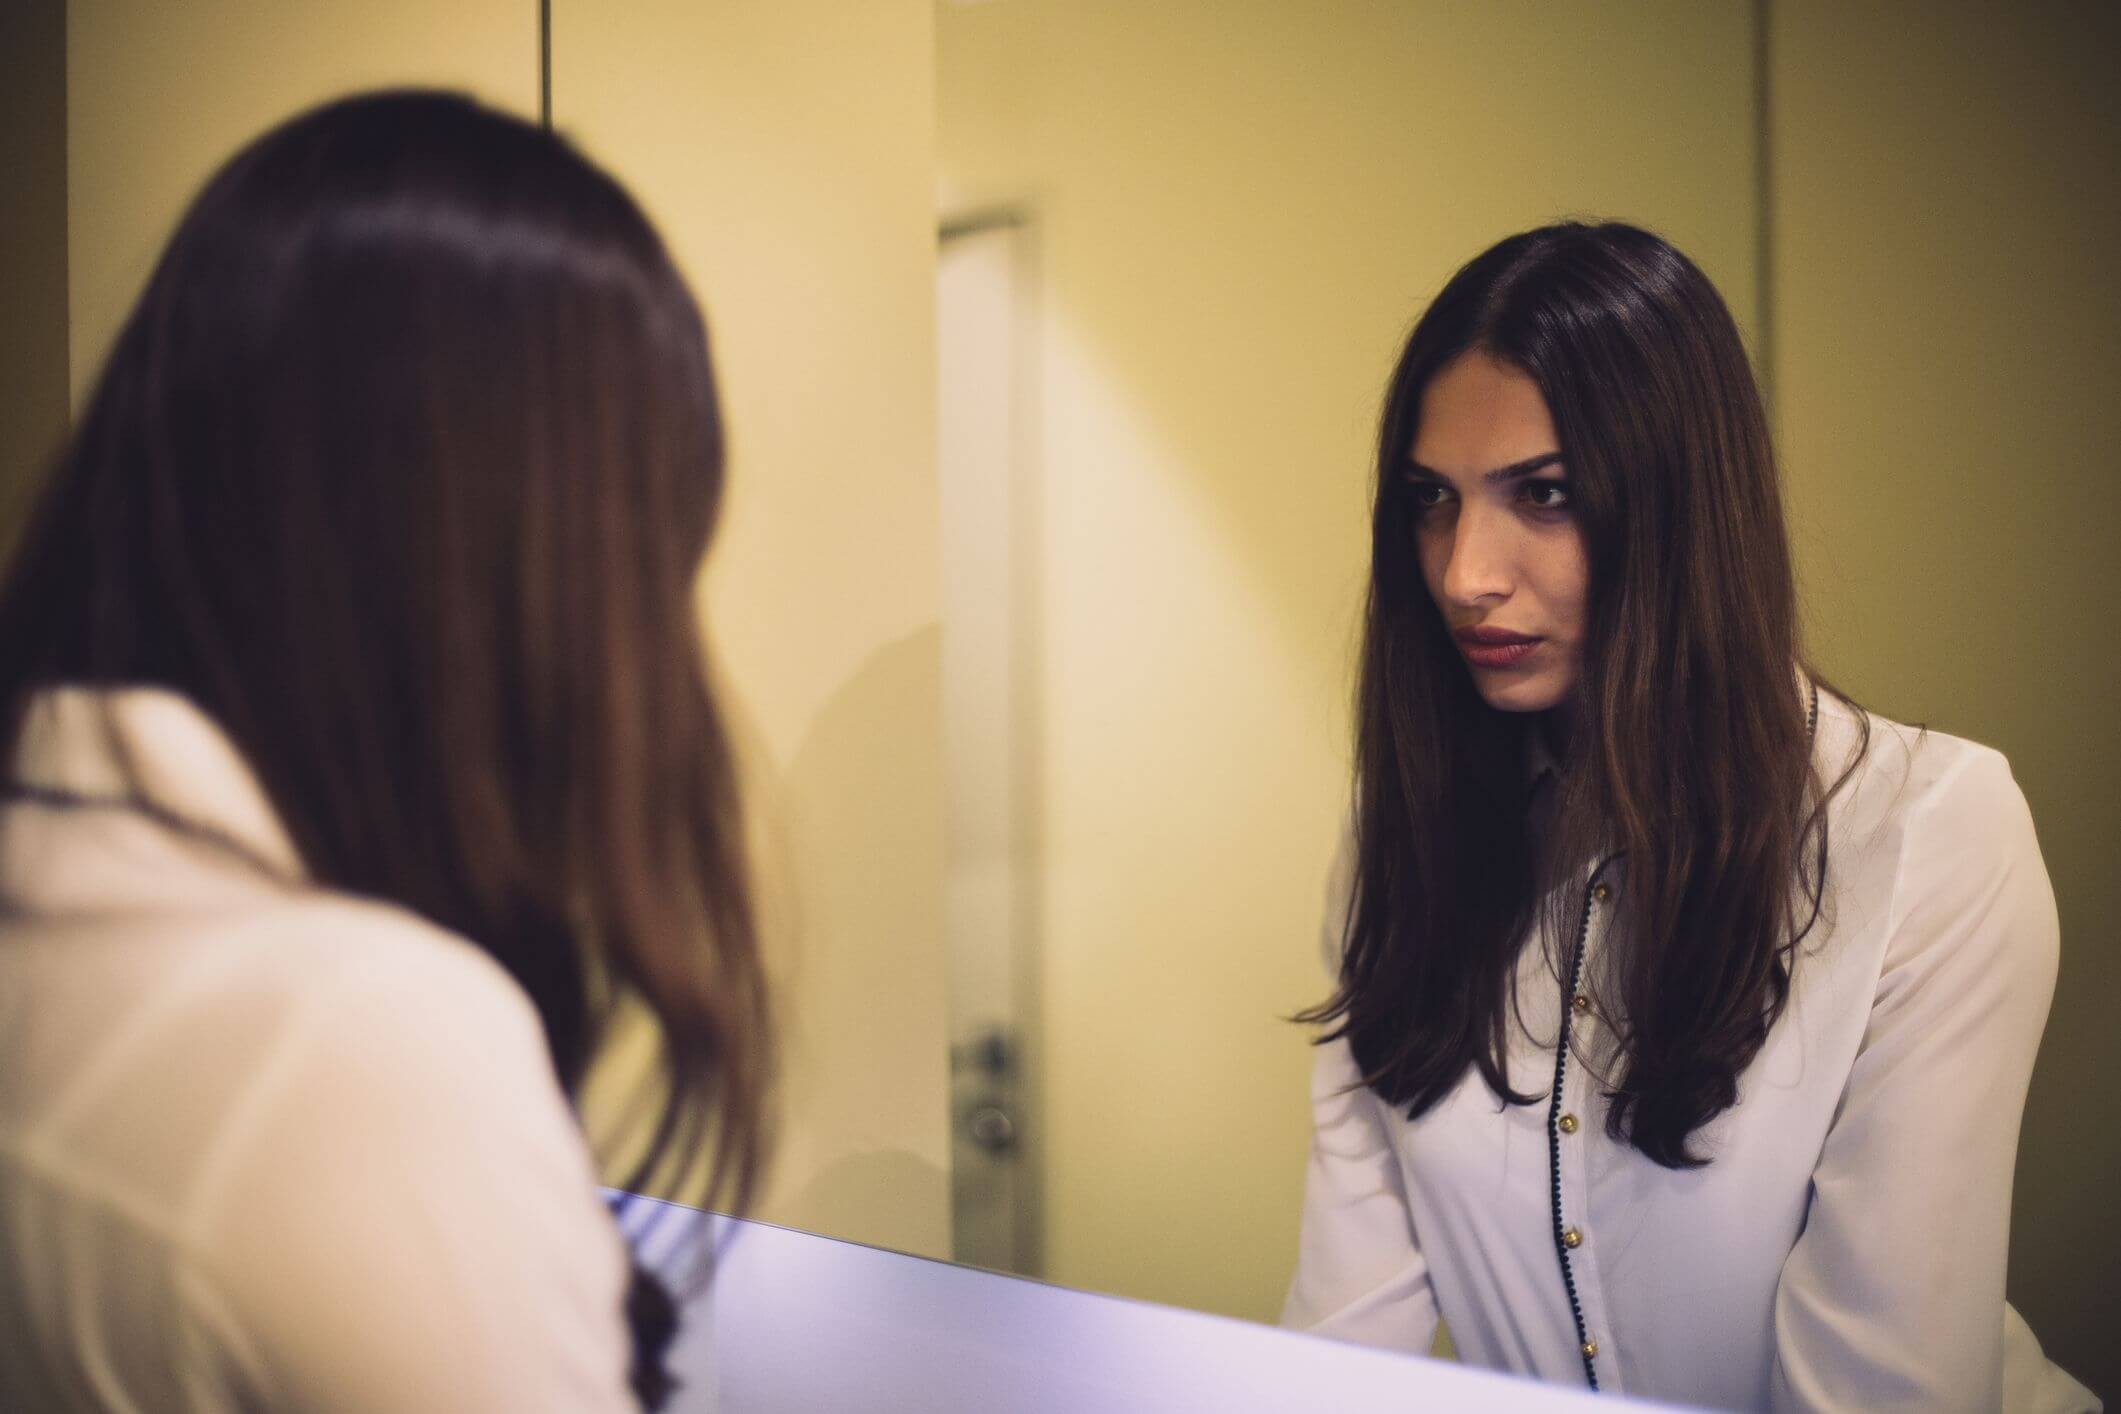 characteristics of a manipulative person